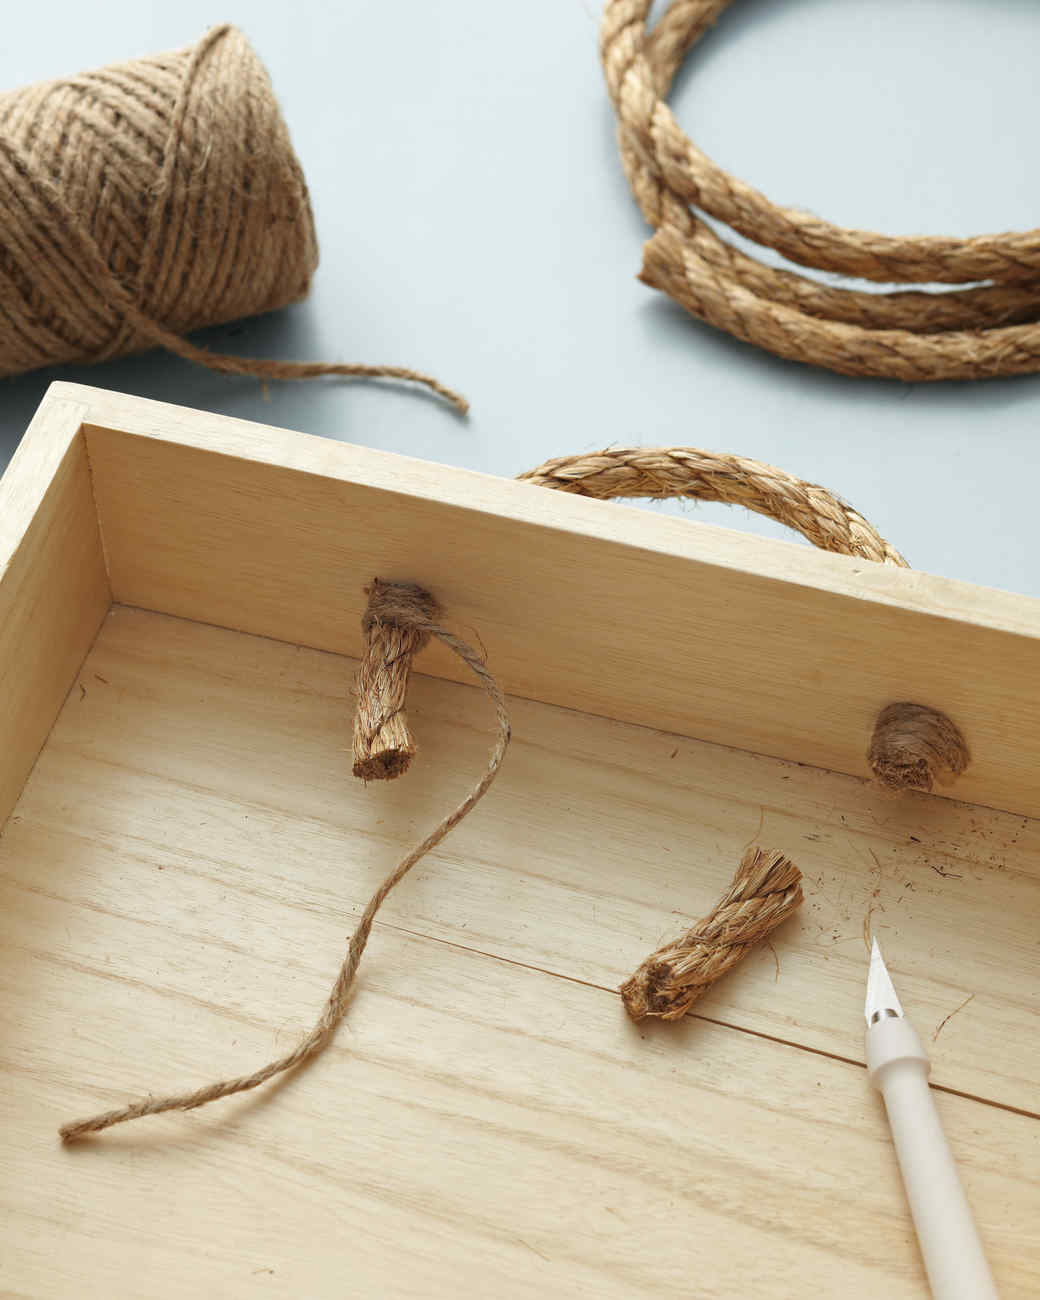 rope-caddy-how-0811mld107418.jpg